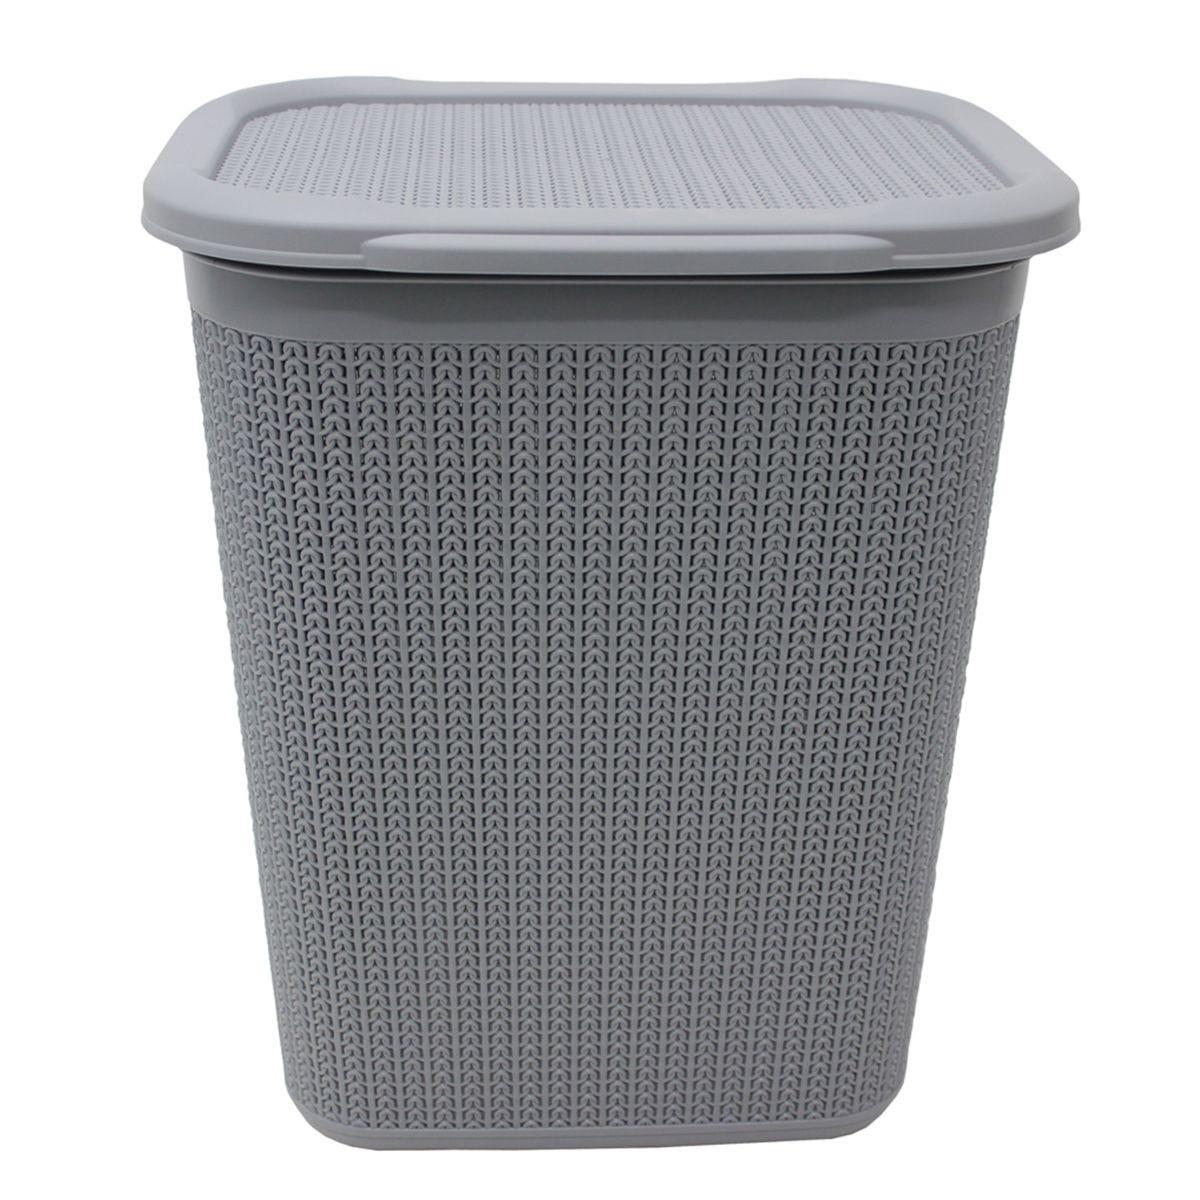 JVL 50L  Laundry Basket - Grey